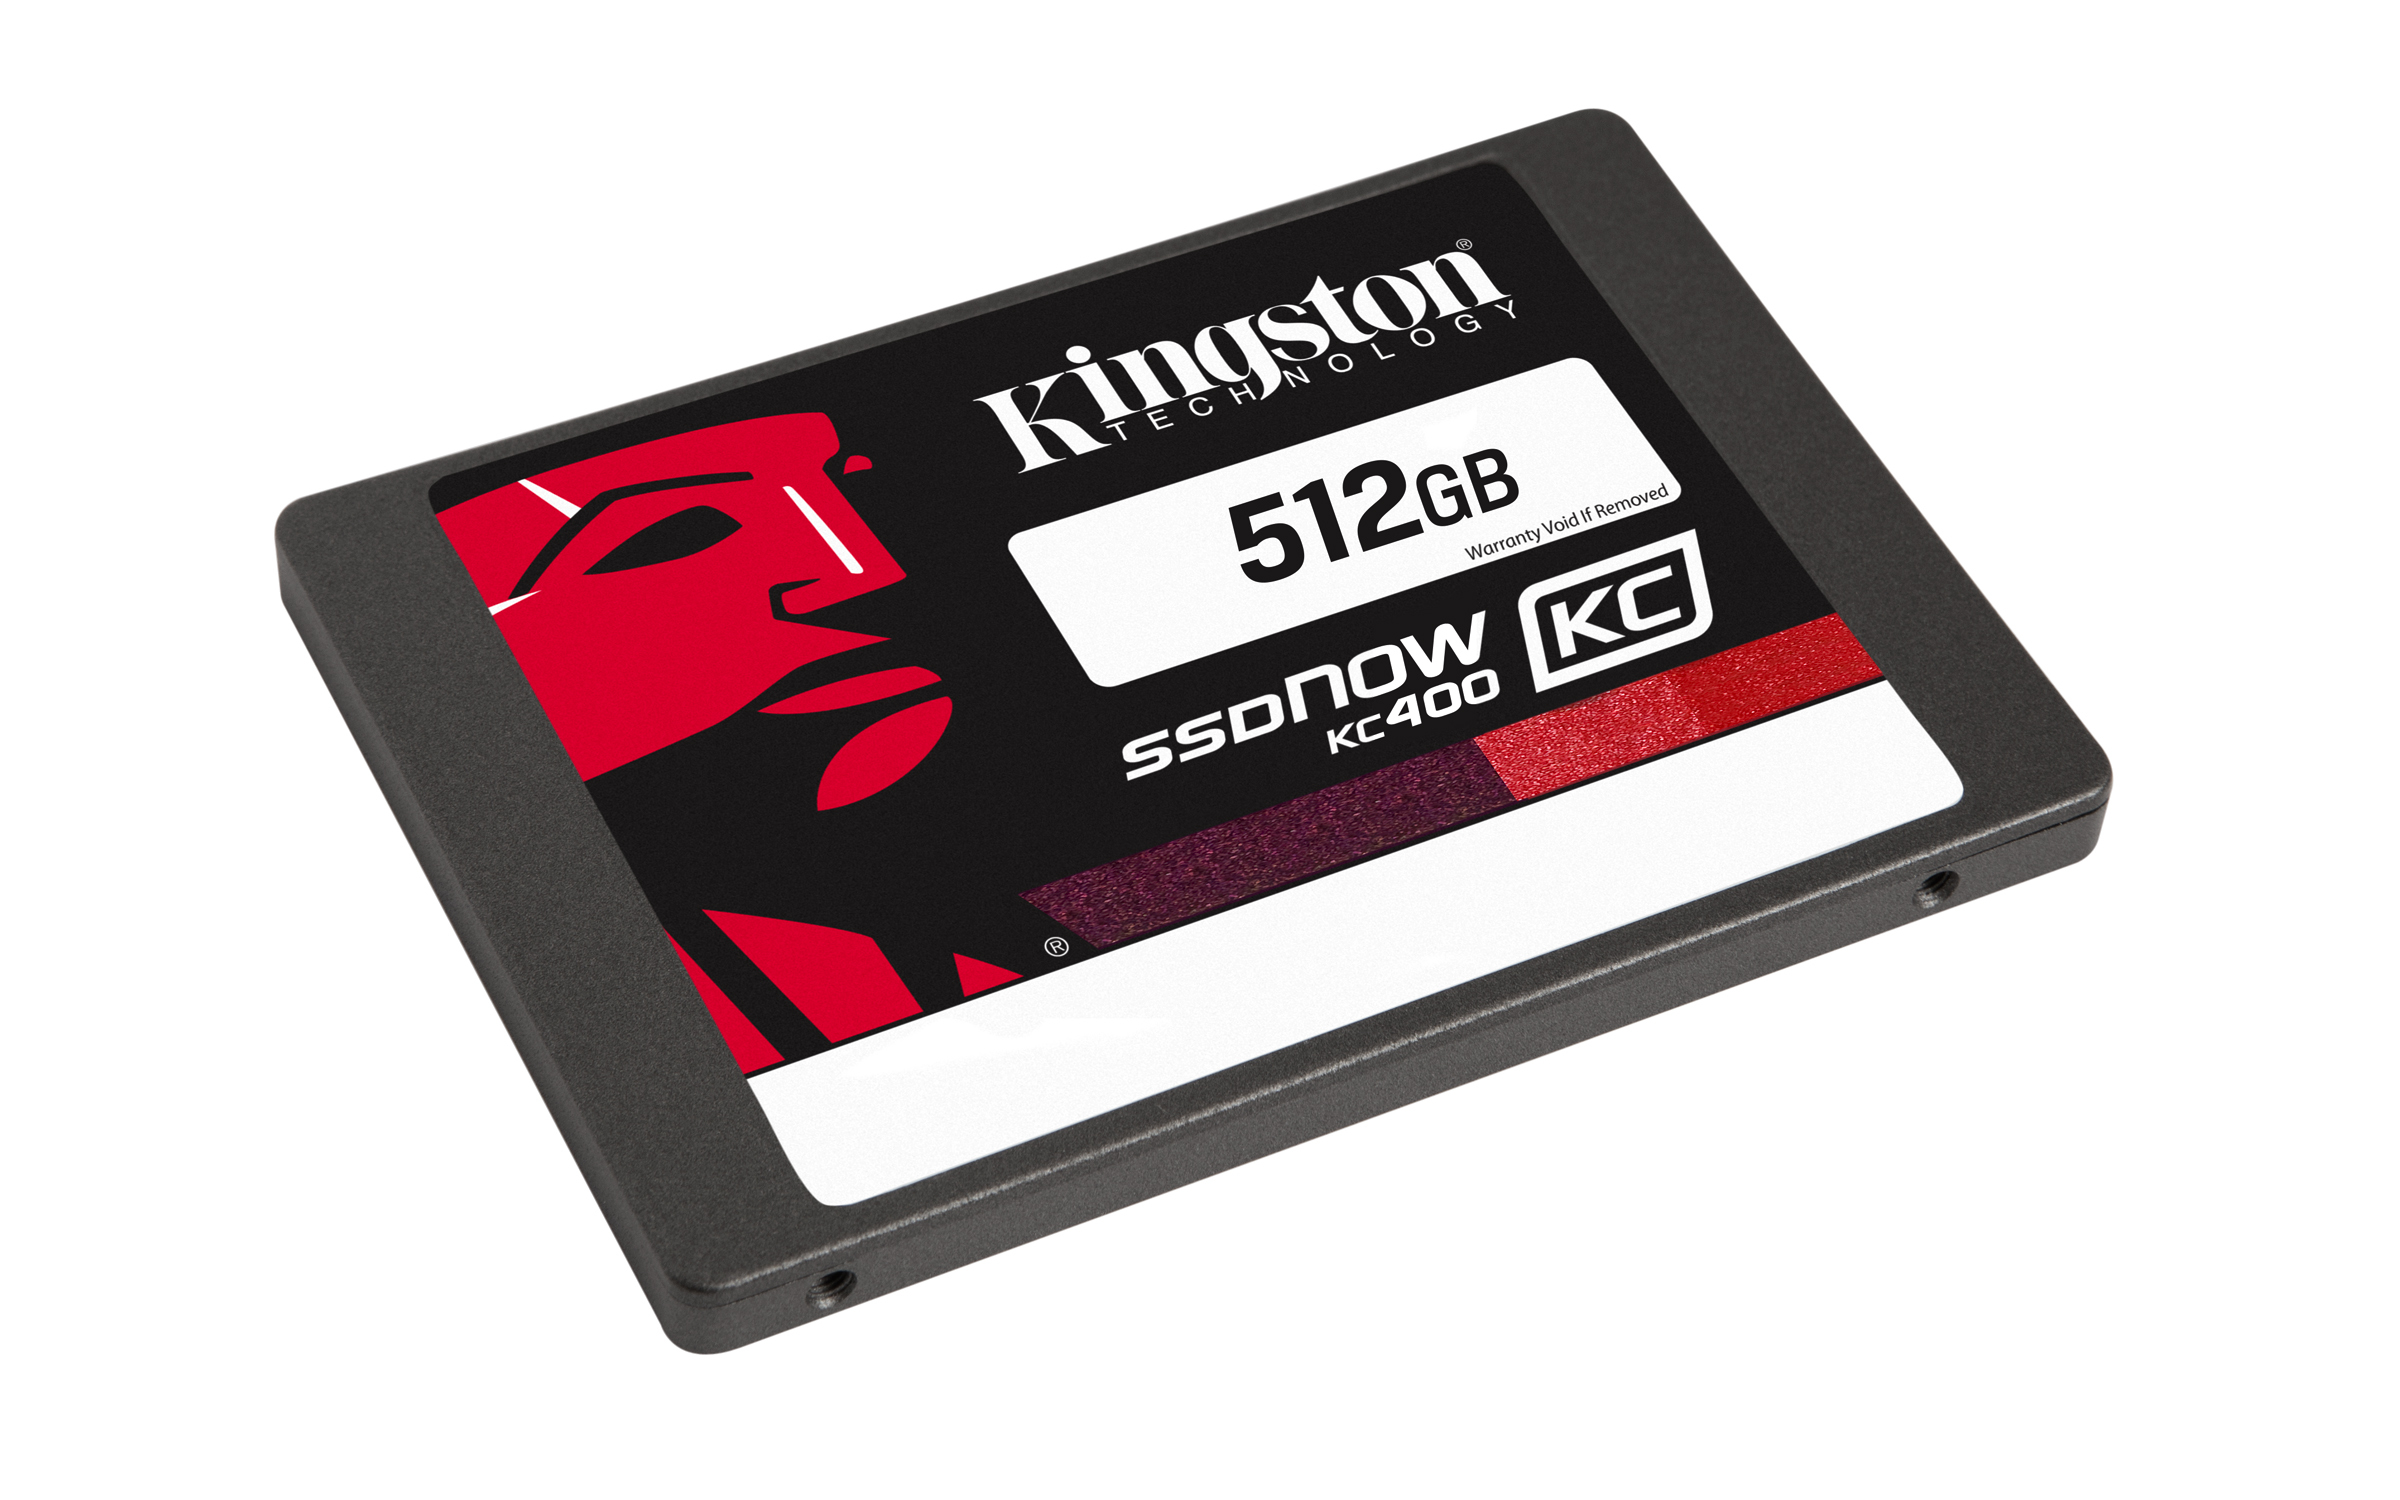 Kingston Technology SSDNow KC400 512GB + Upgrade Kit 512GB